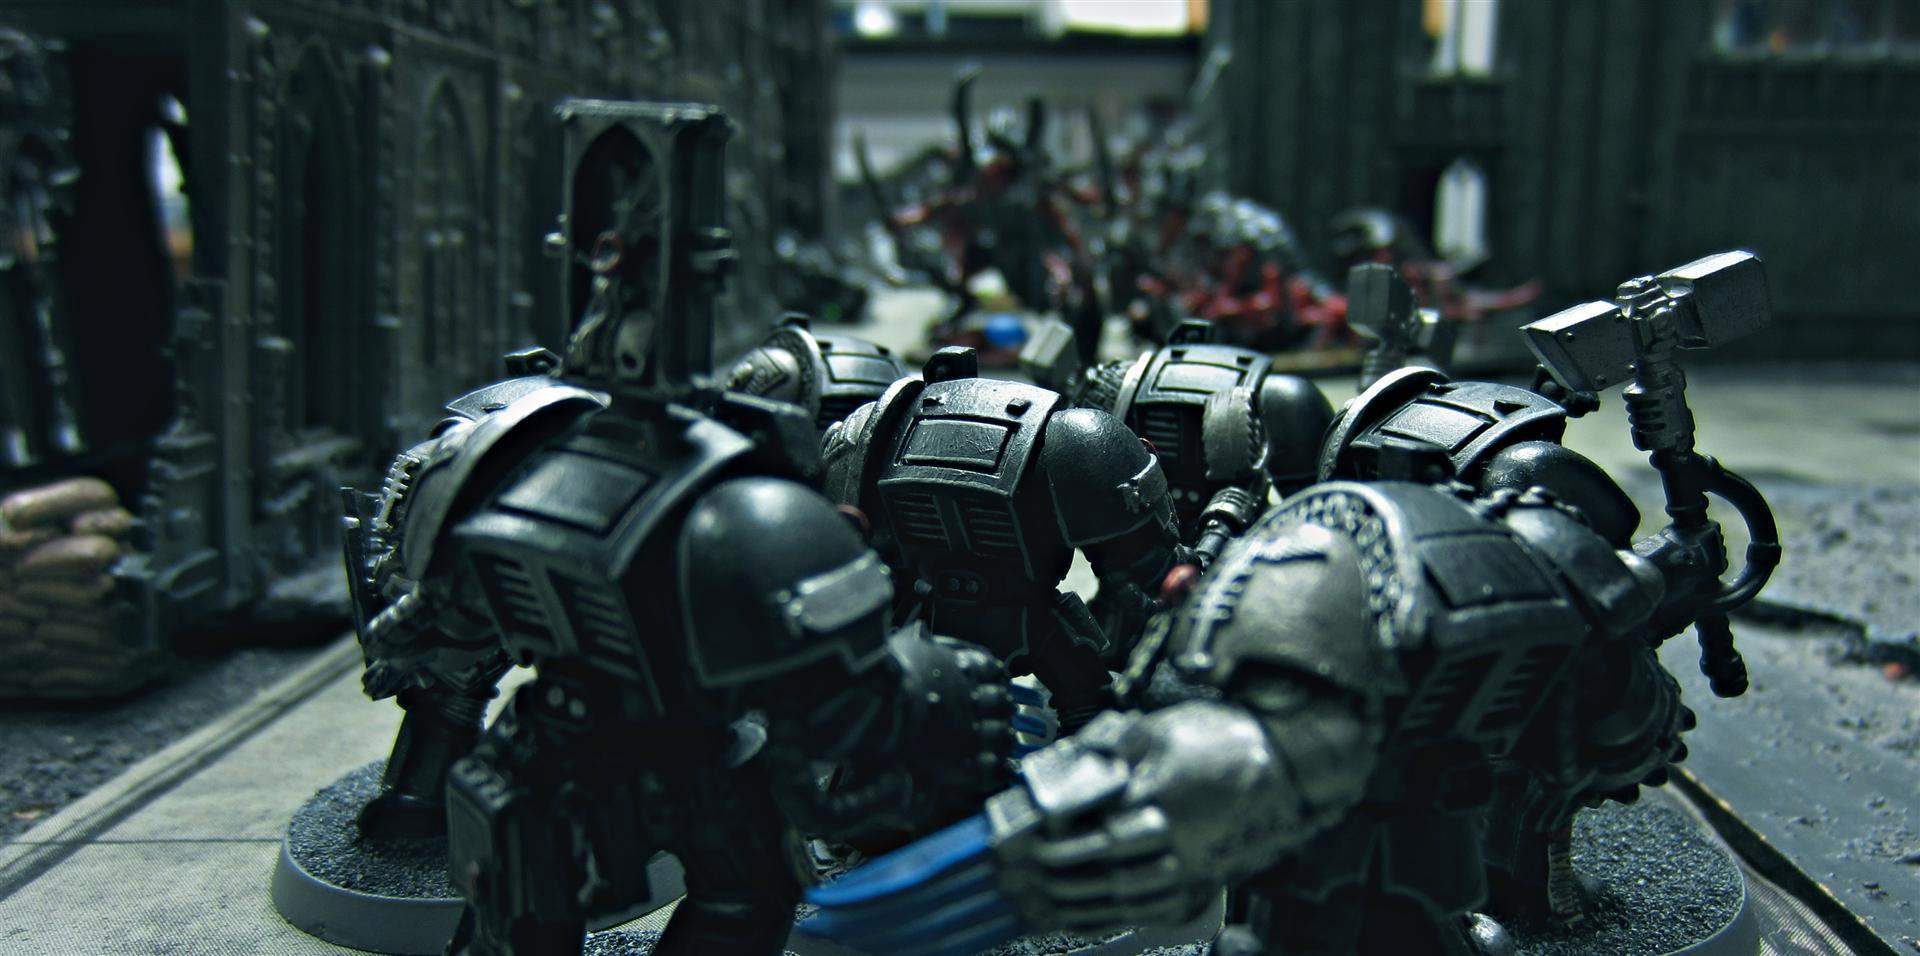 Alien Hunter, Alien Hunters, Black Shields, Blackshields, Death Watch, Deathwatch, Inquisition, Inquisitorial, Kill Team, Killteam, Lightning Claw, Space Marines, Storm Shield, Terminator Armor, Thunder Hammer, Warhammer 40,000